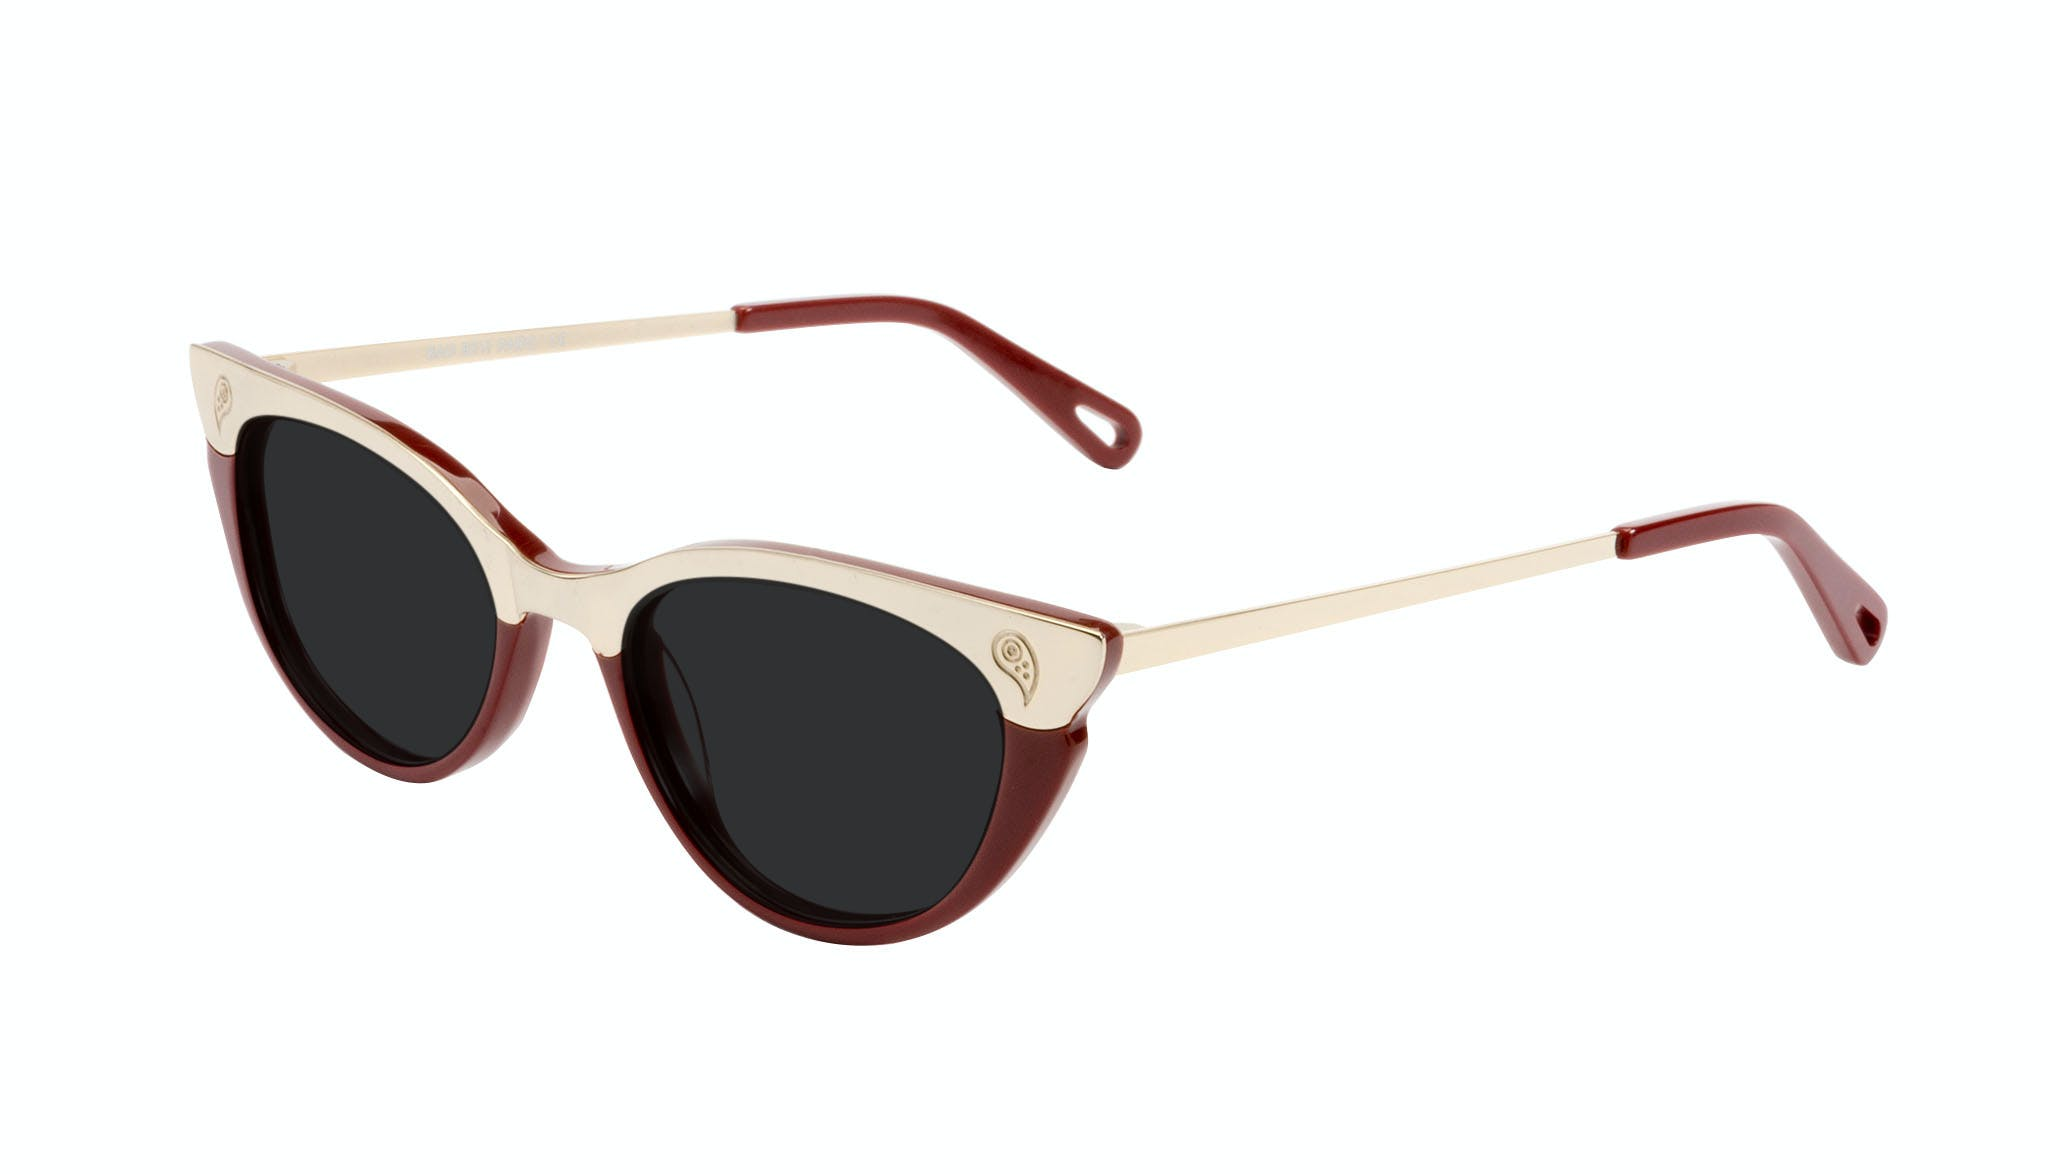 Affordable Fashion Glasses Cat Eye Daring Cateye Sunglasses Women Bad Beti Paro Tilt